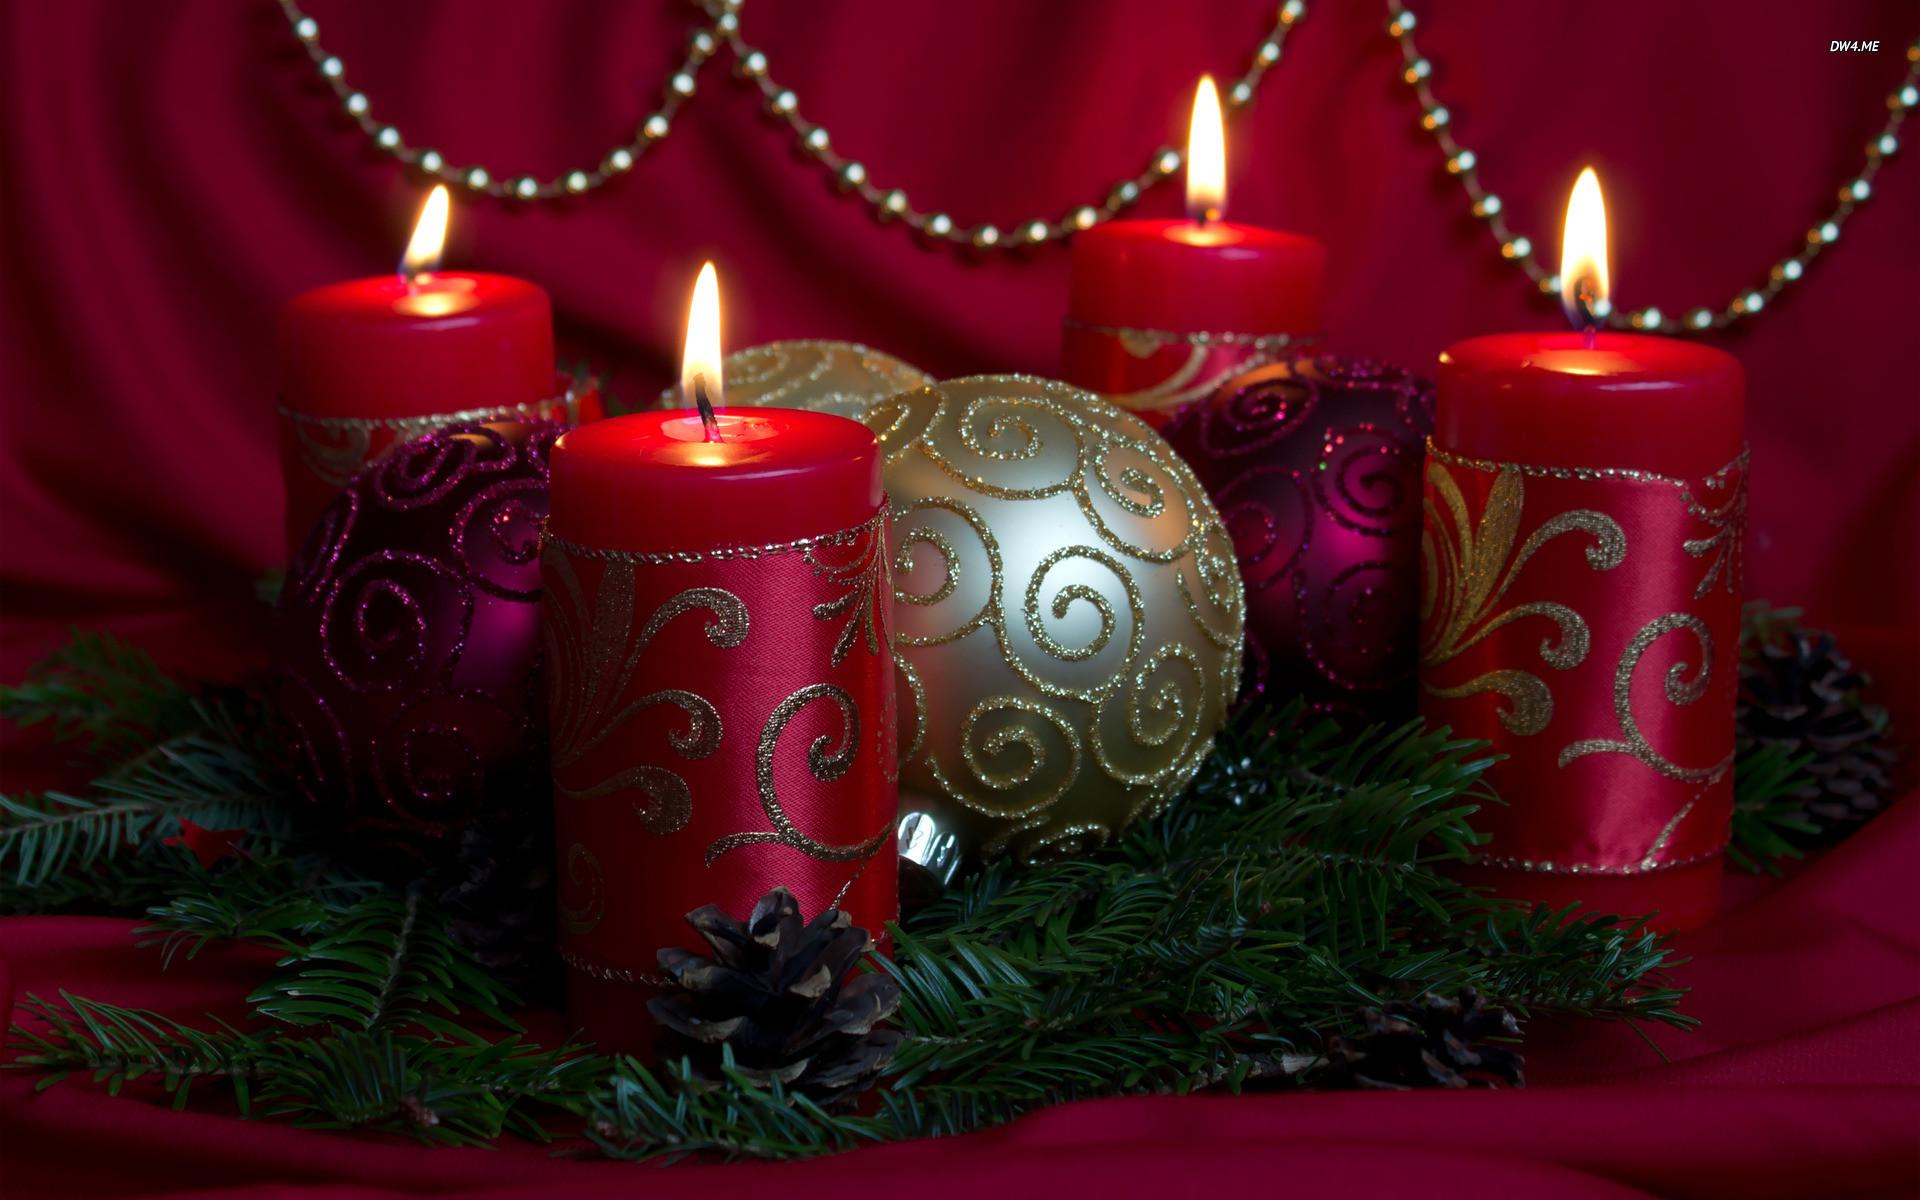 … Advent candles wallpaper …